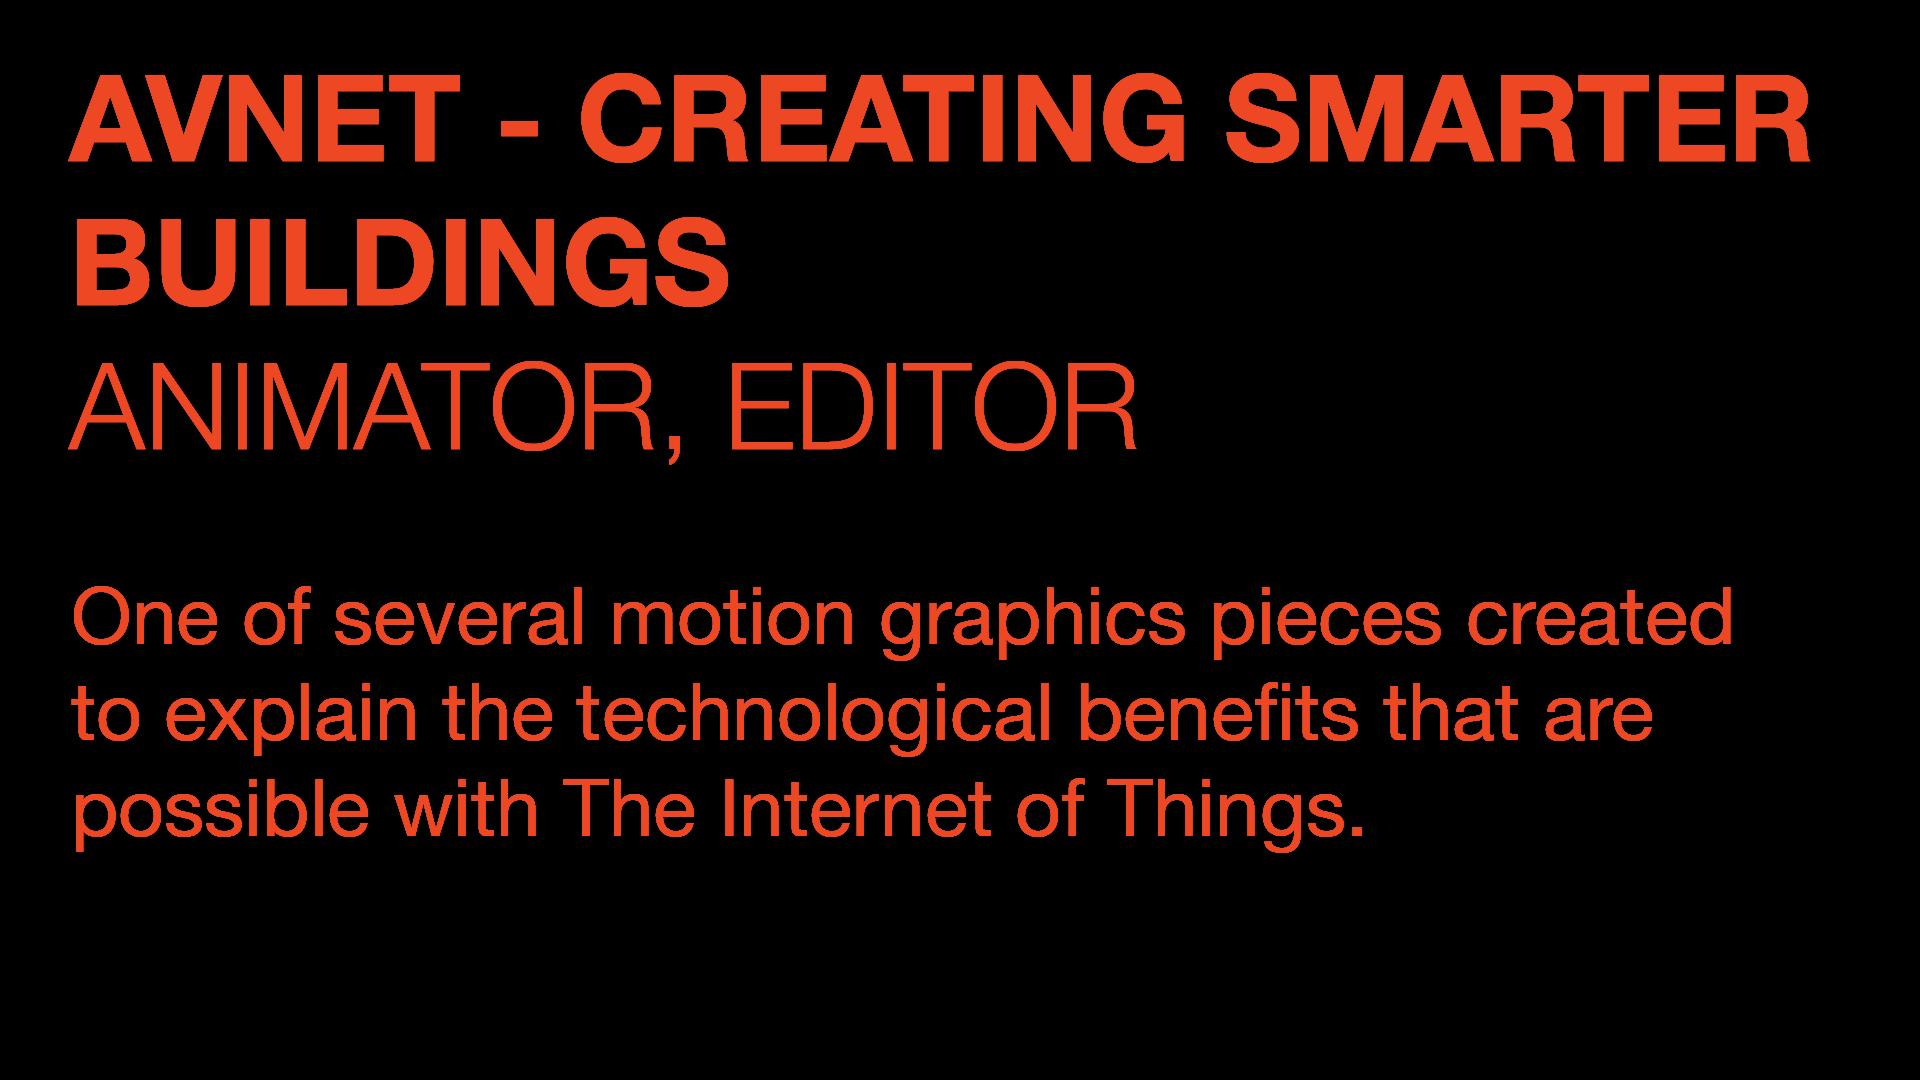 Avnet - Creating Smarter Buildings.png